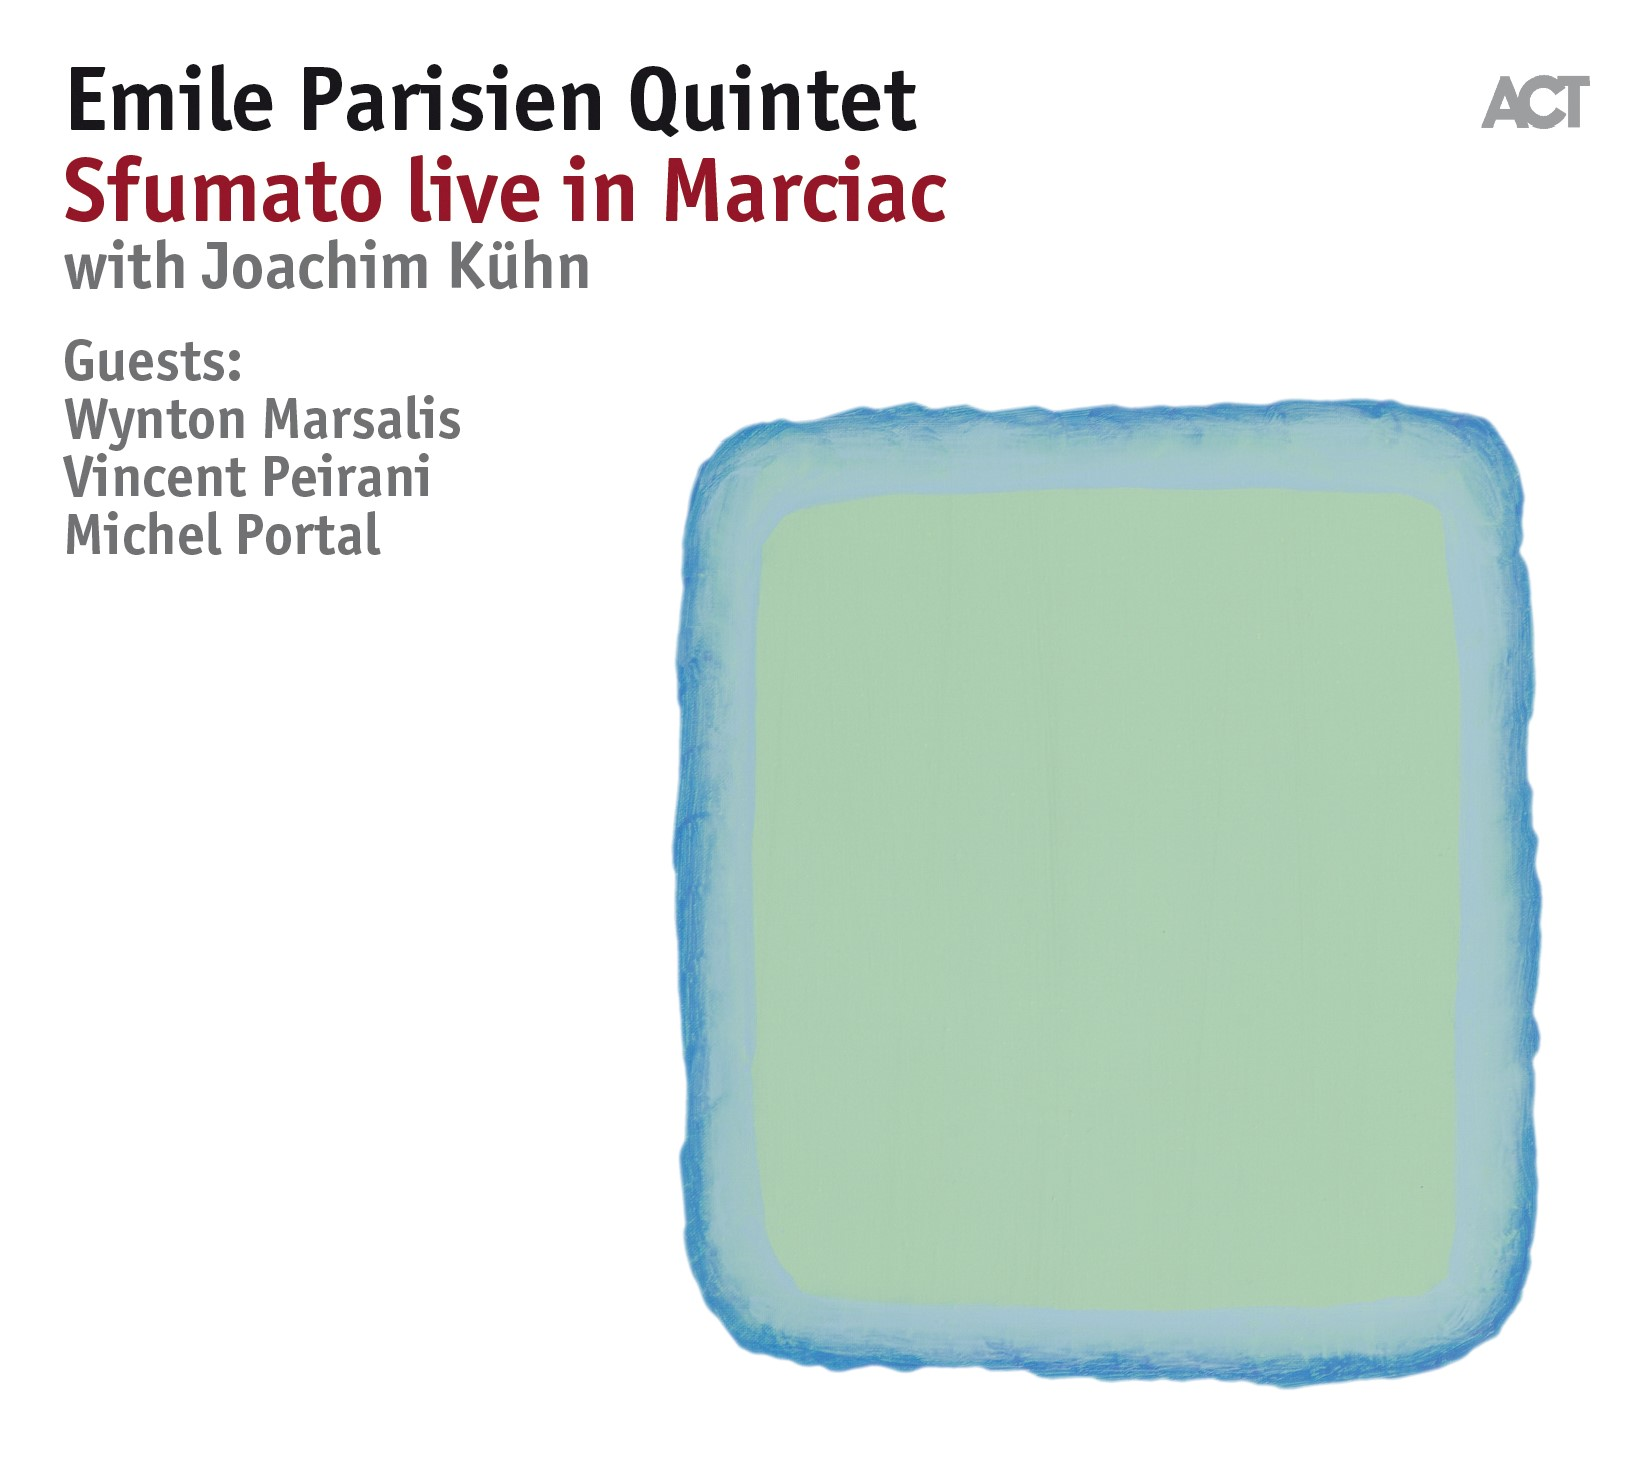 Emile Parisien</br>Sfumato live in Marciac</br>ACT, 2018